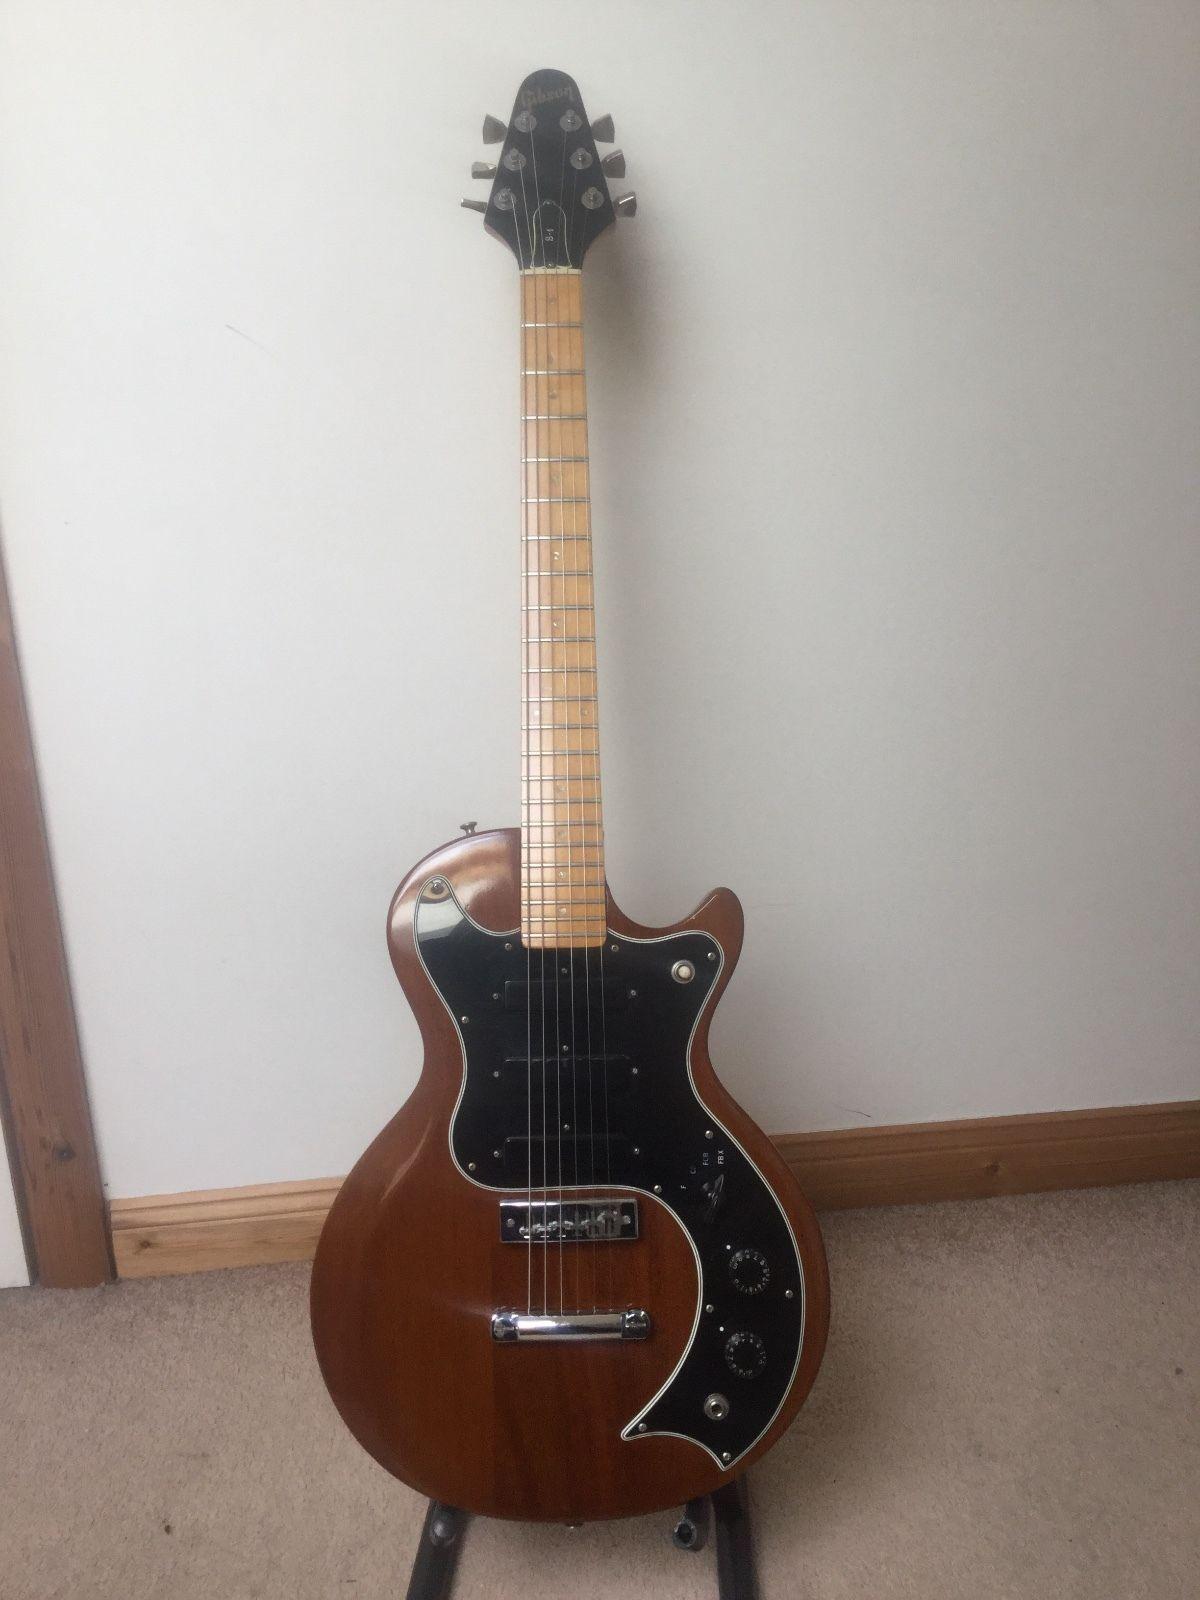 gibson s1 electric guitar [ 1200 x 1600 Pixel ]